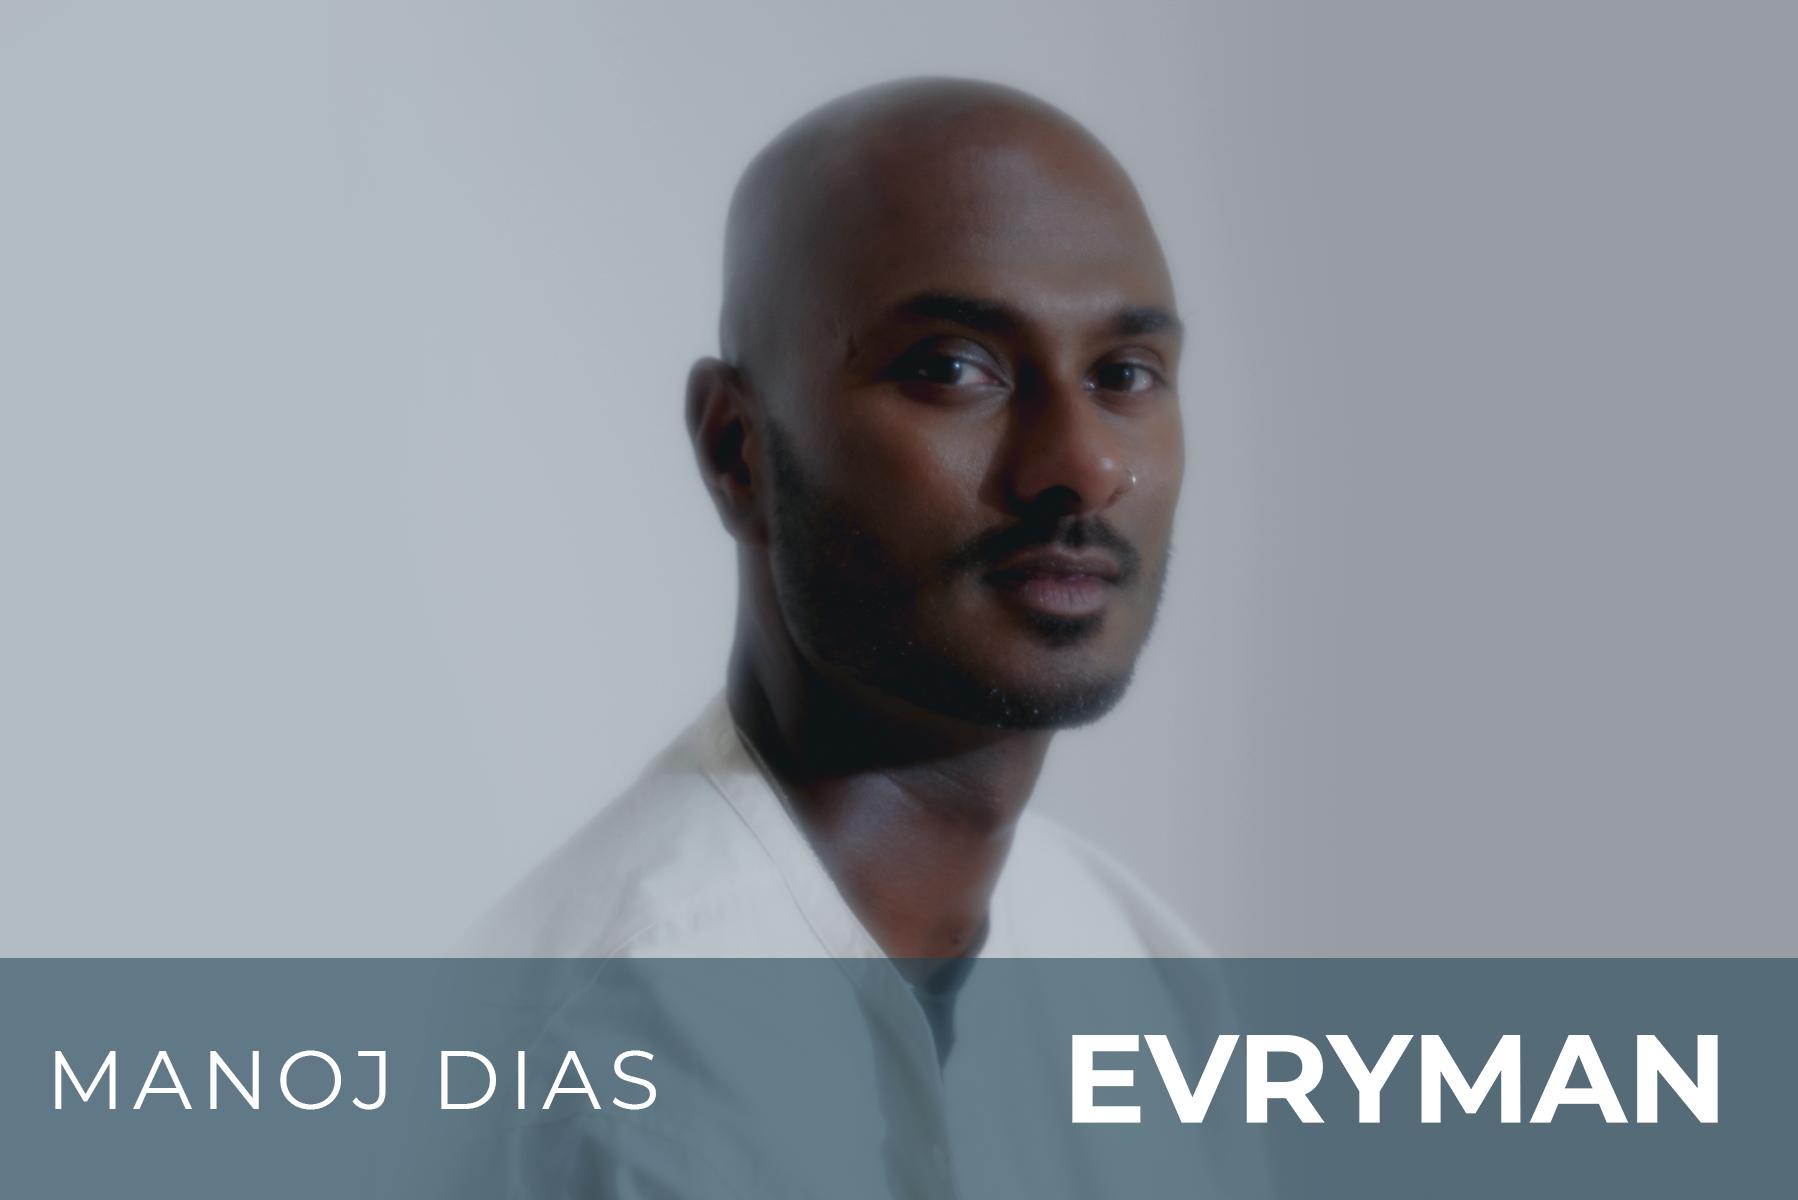 Beyond Mindfulness: EVRYMAN Community Call with special guest Manoj Dias